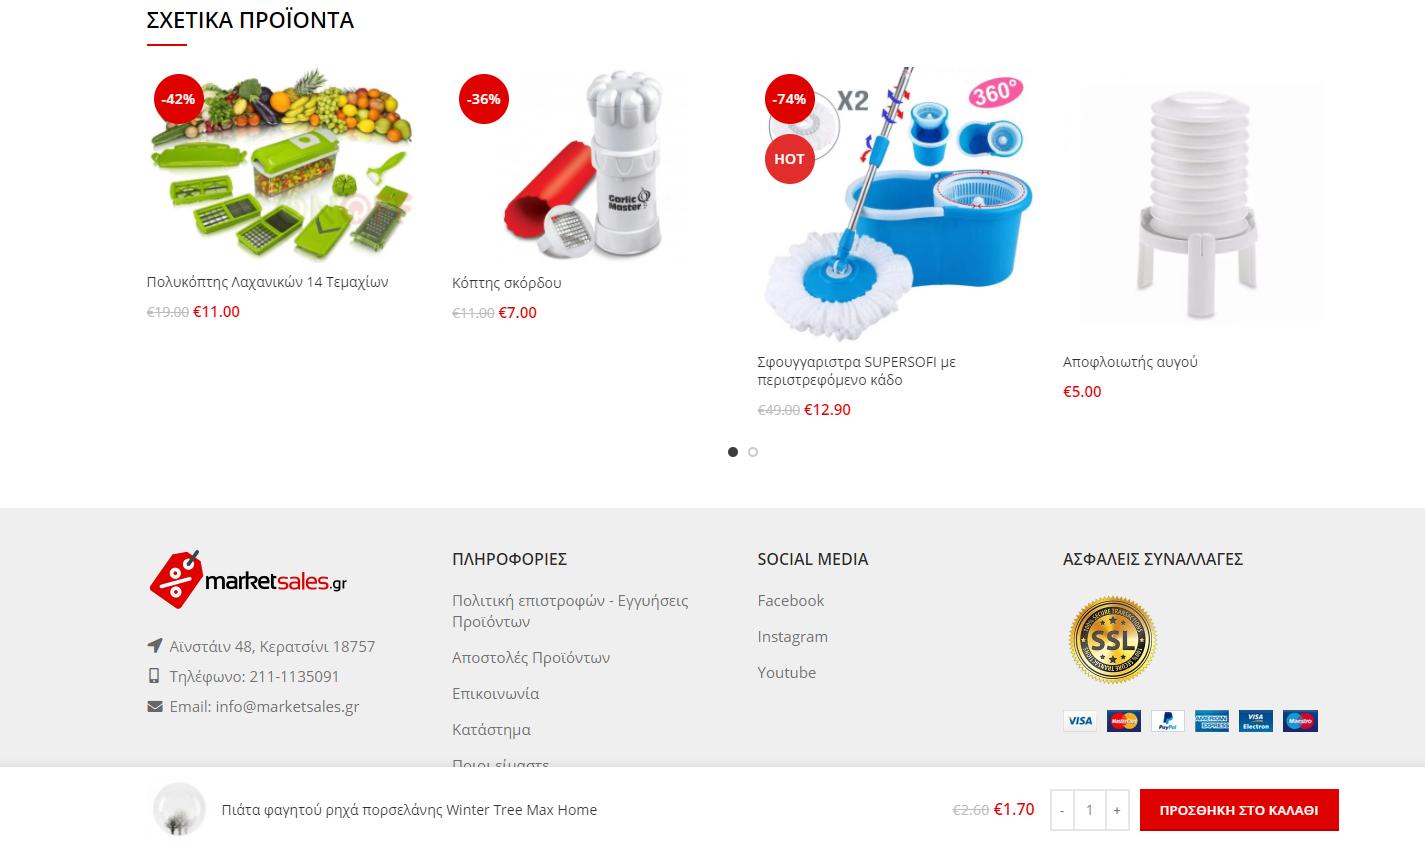 marktesales kataskui footer - Κατασκευή eshop Marketsales - 3site